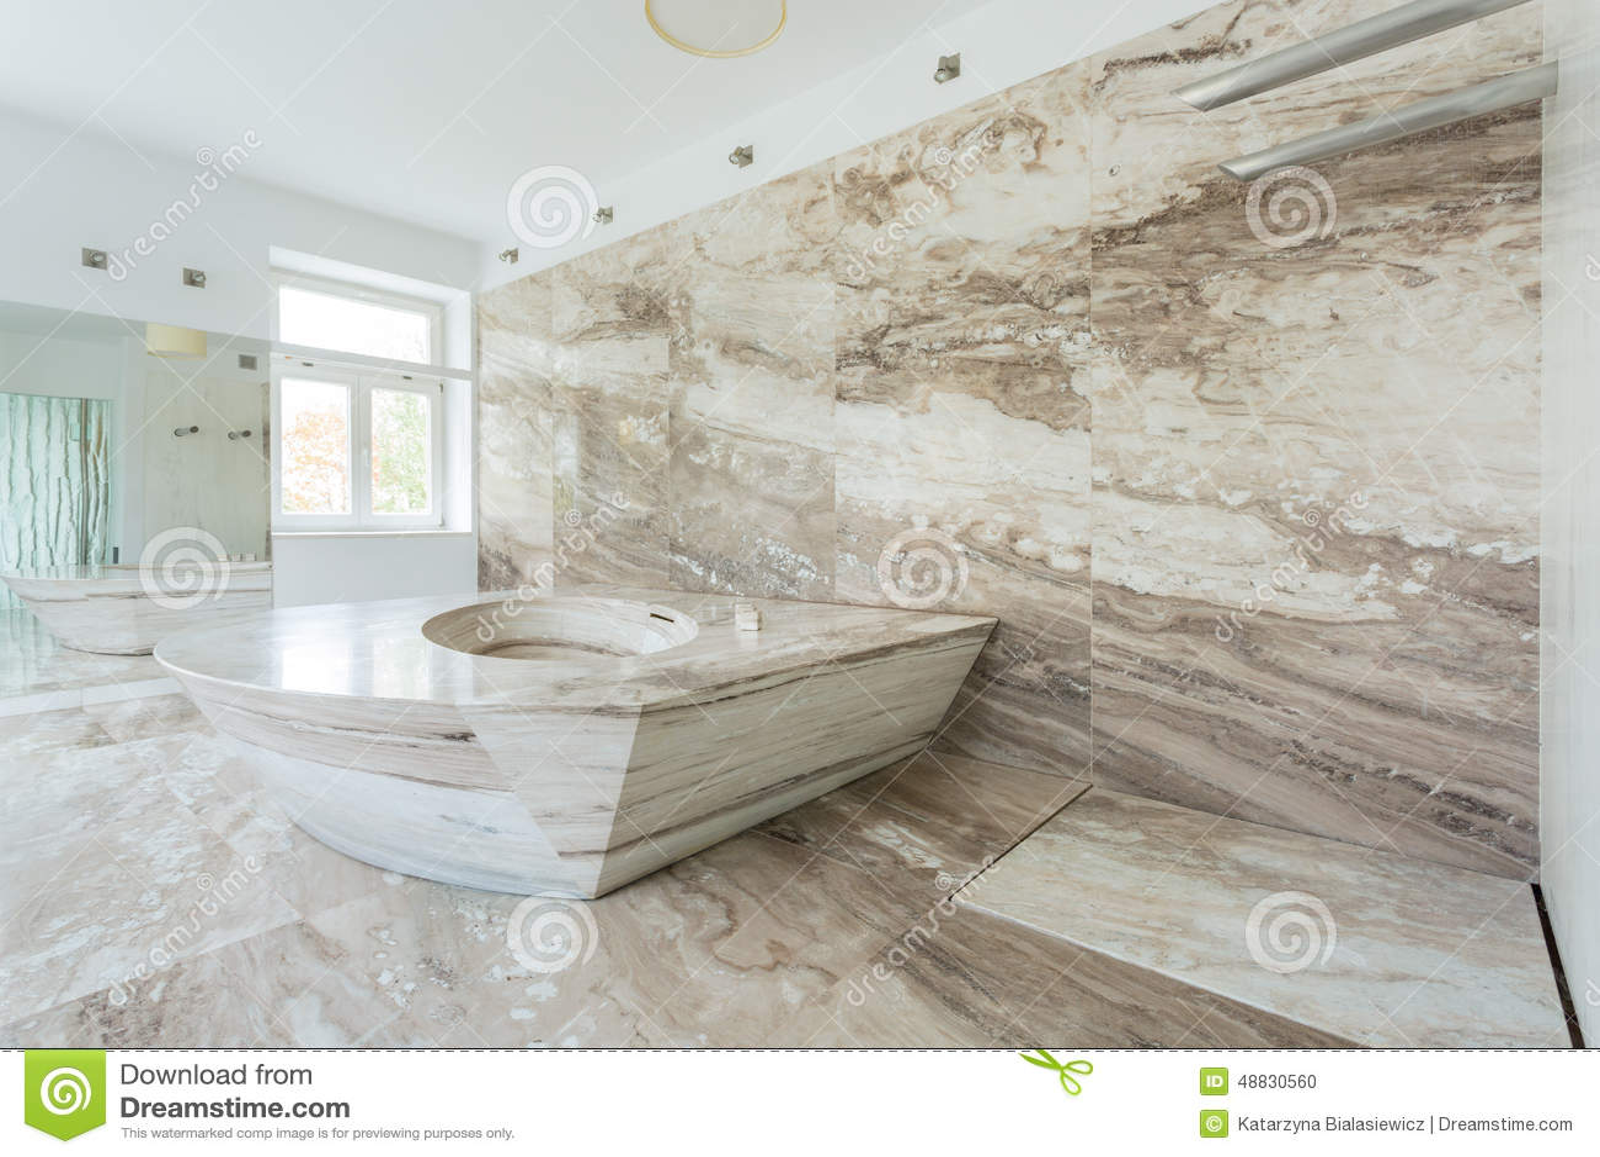 Lyxigt badrum med marmortegelplattor